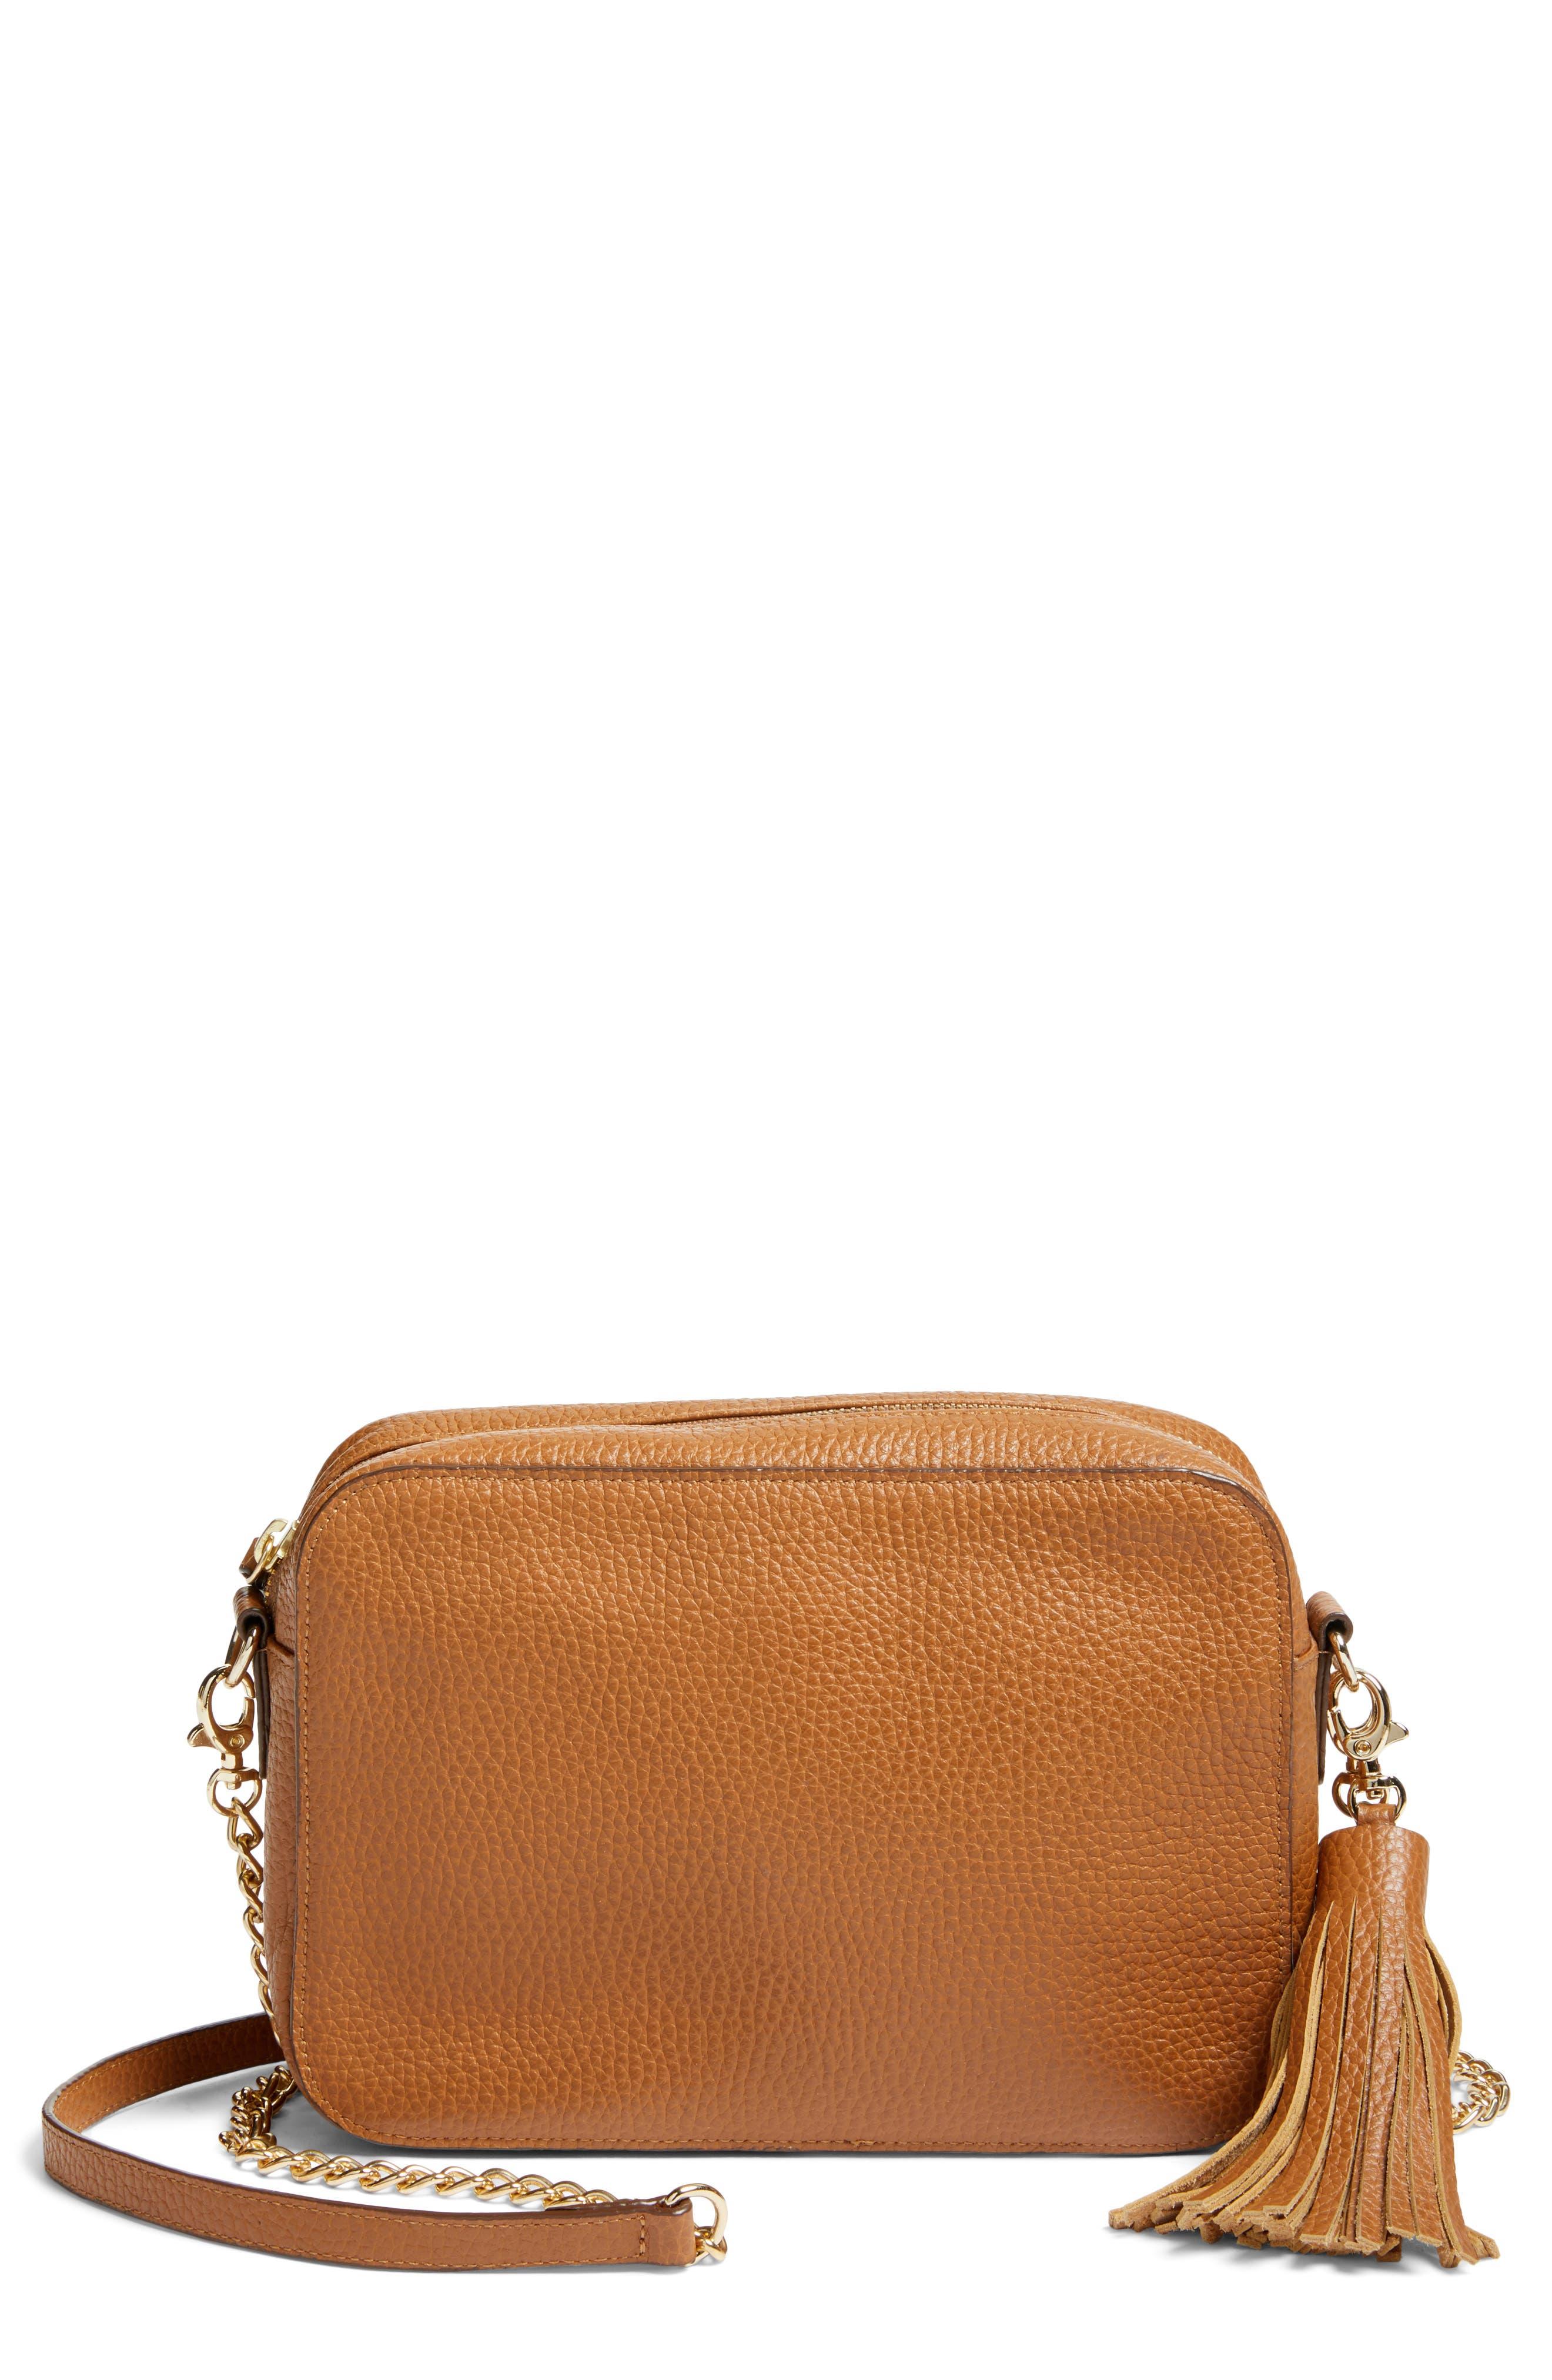 Ella Tassel Leather Crossbody Bag,                         Main,                         color, Tan Spice